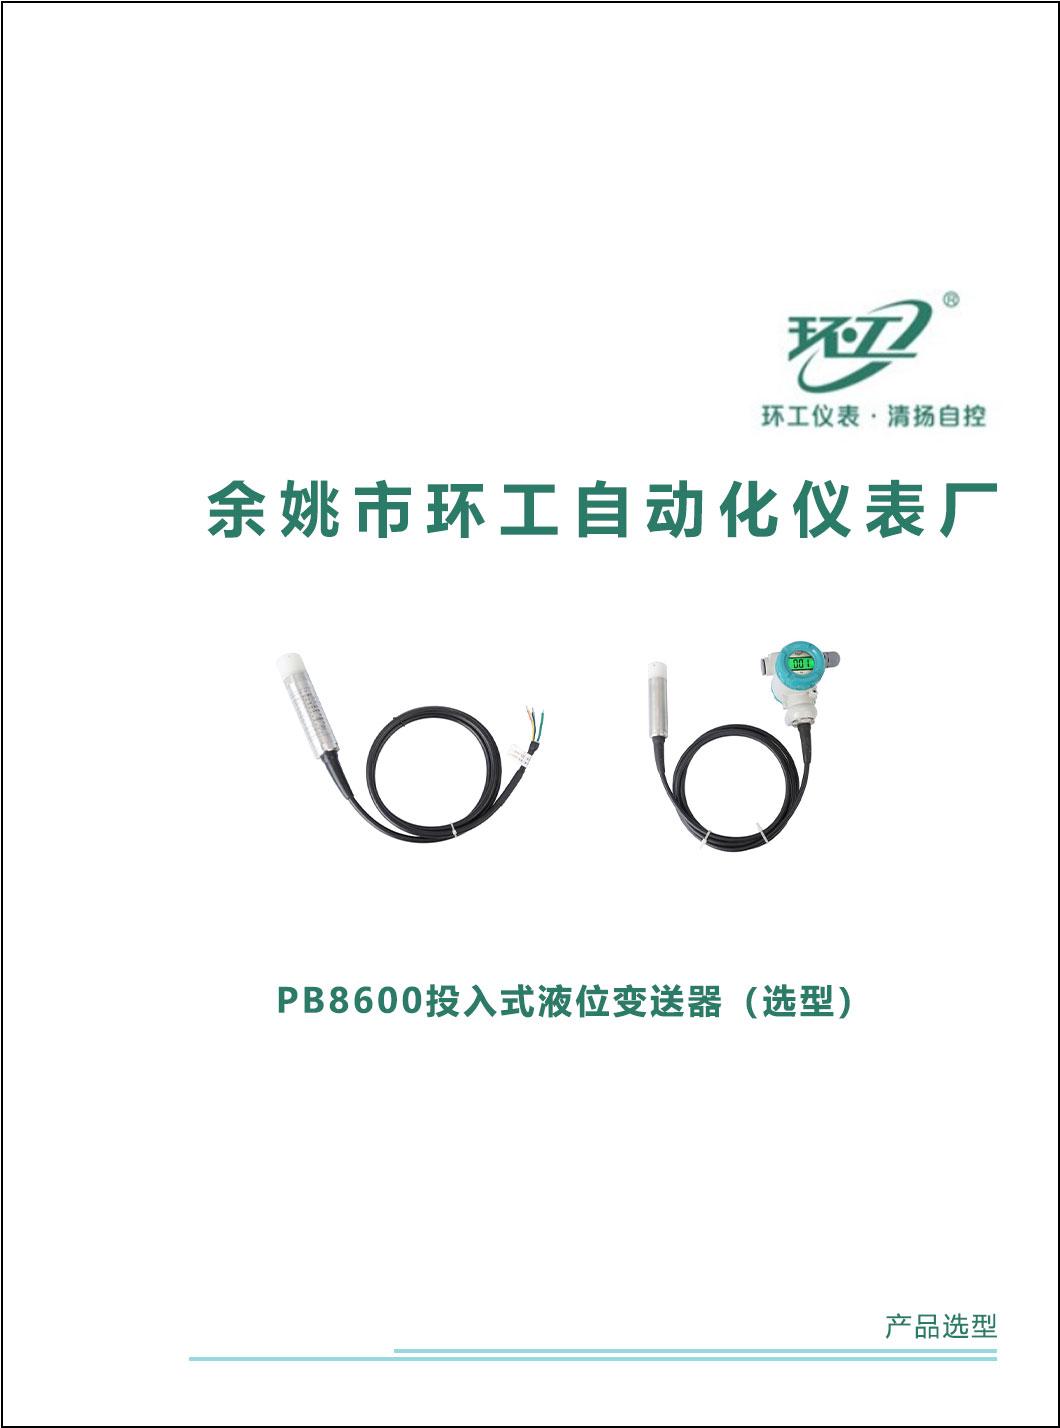 PB8600投入式液位变送器-环工仪表-清扬自控